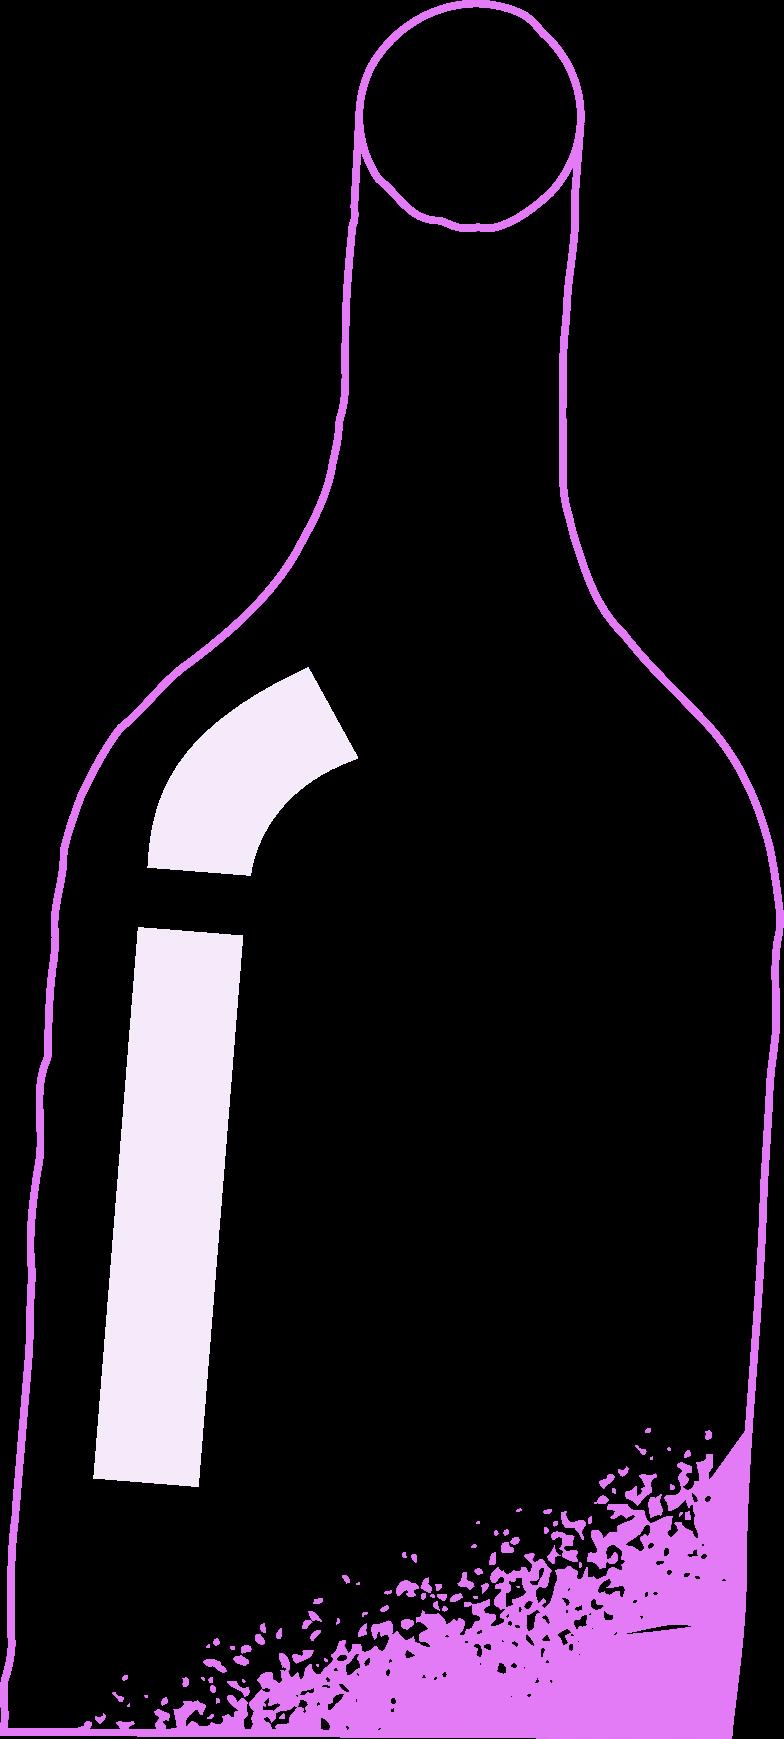 Schlechte gateway-flasche Clipart-Grafik als PNG, SVG